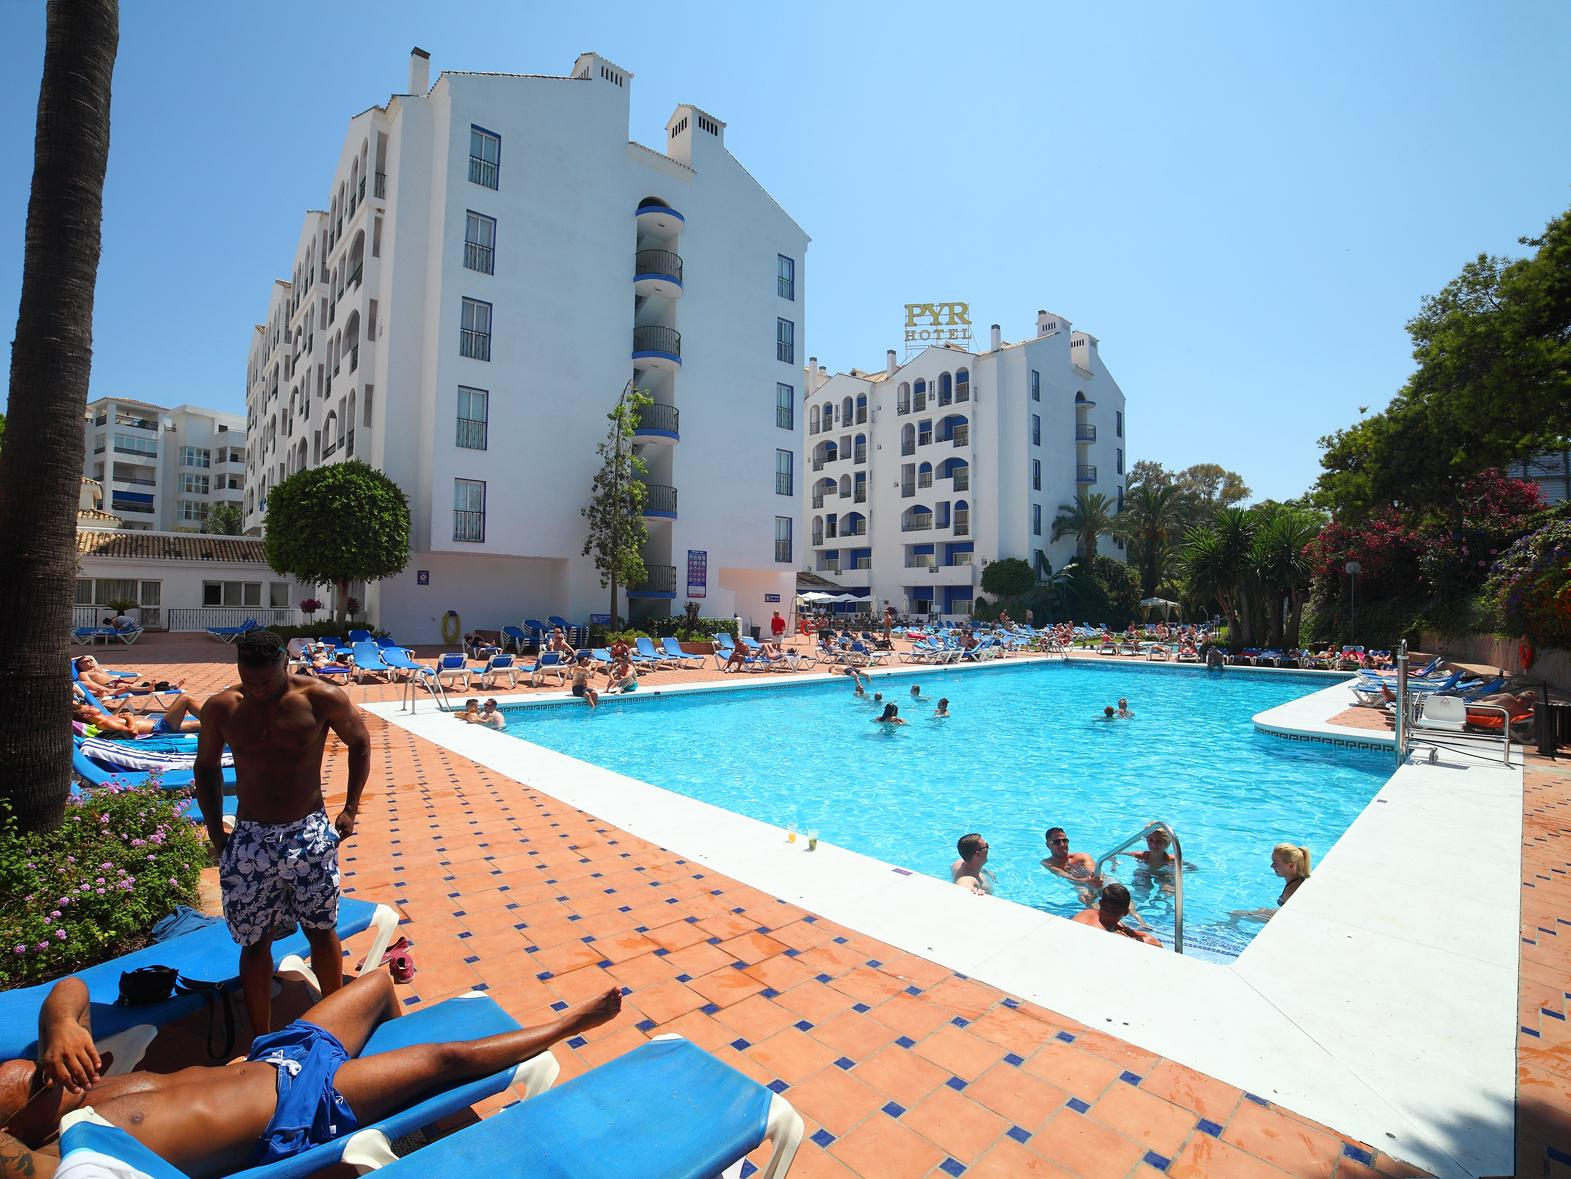 Hotel Pyr Marbella Marbella İspanya - Agoda'dan En Uygun ... serapportantà Aloha Piscine